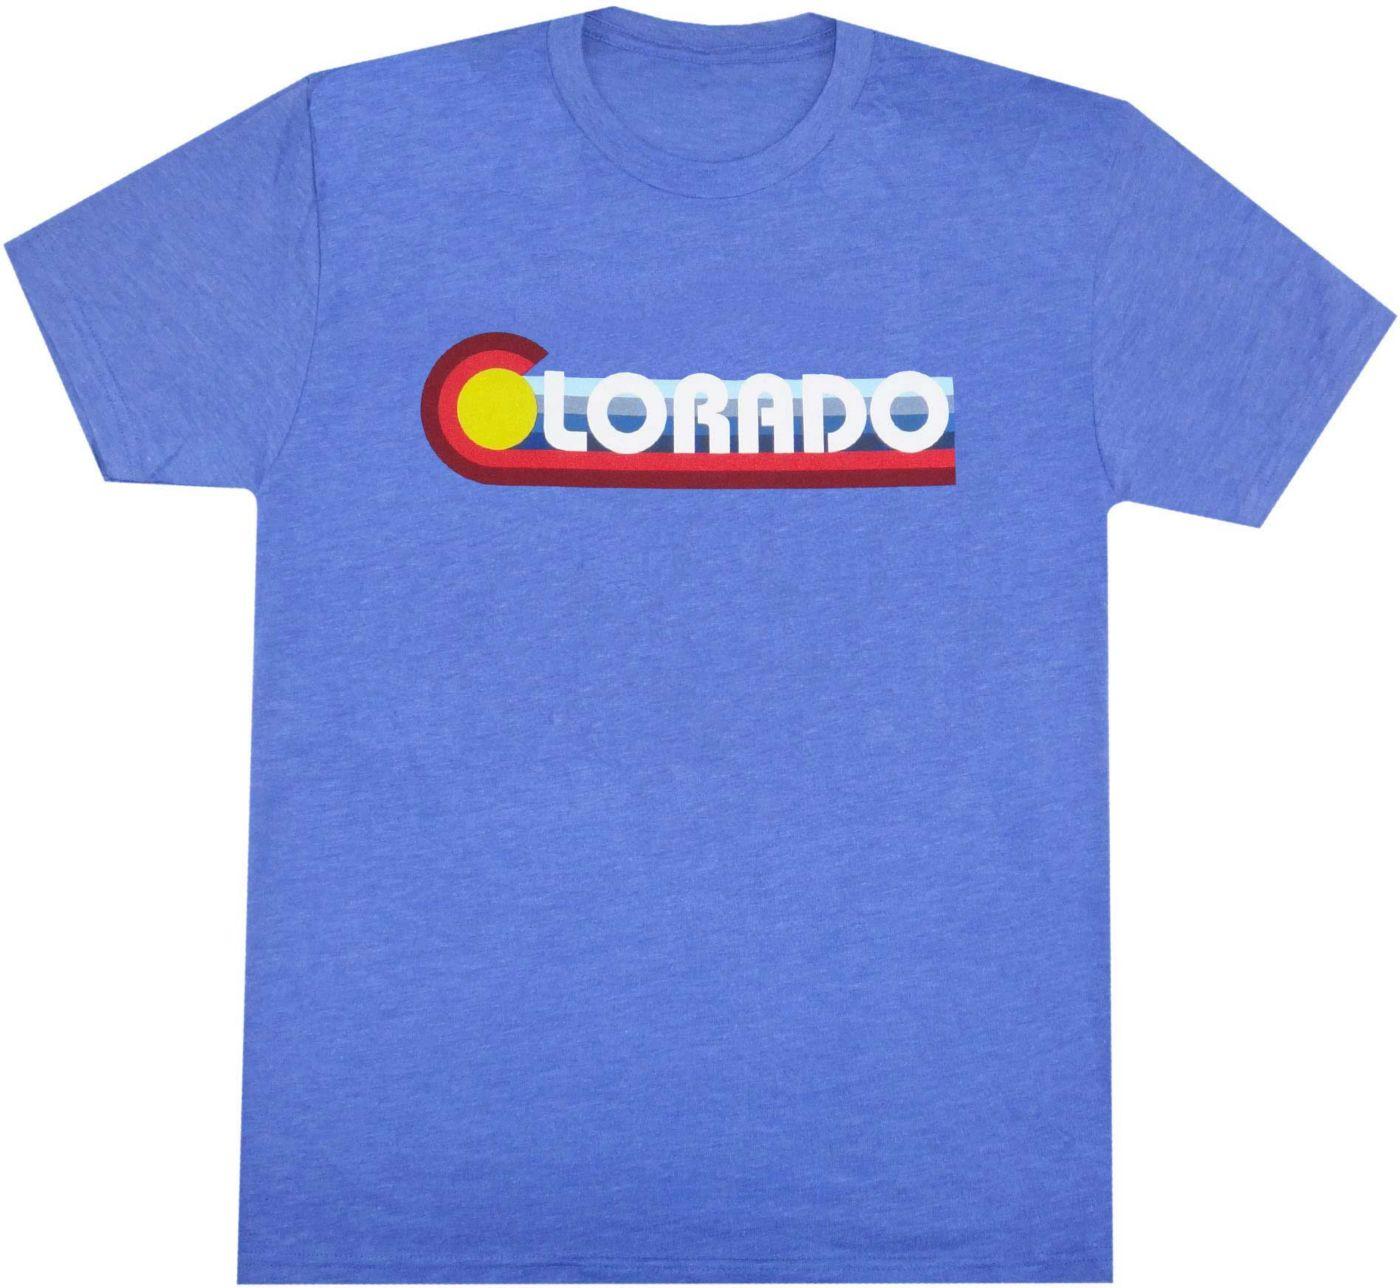 Aksels Men's Colorado Scape Tri-Blend Short Sleeve T-Shirt